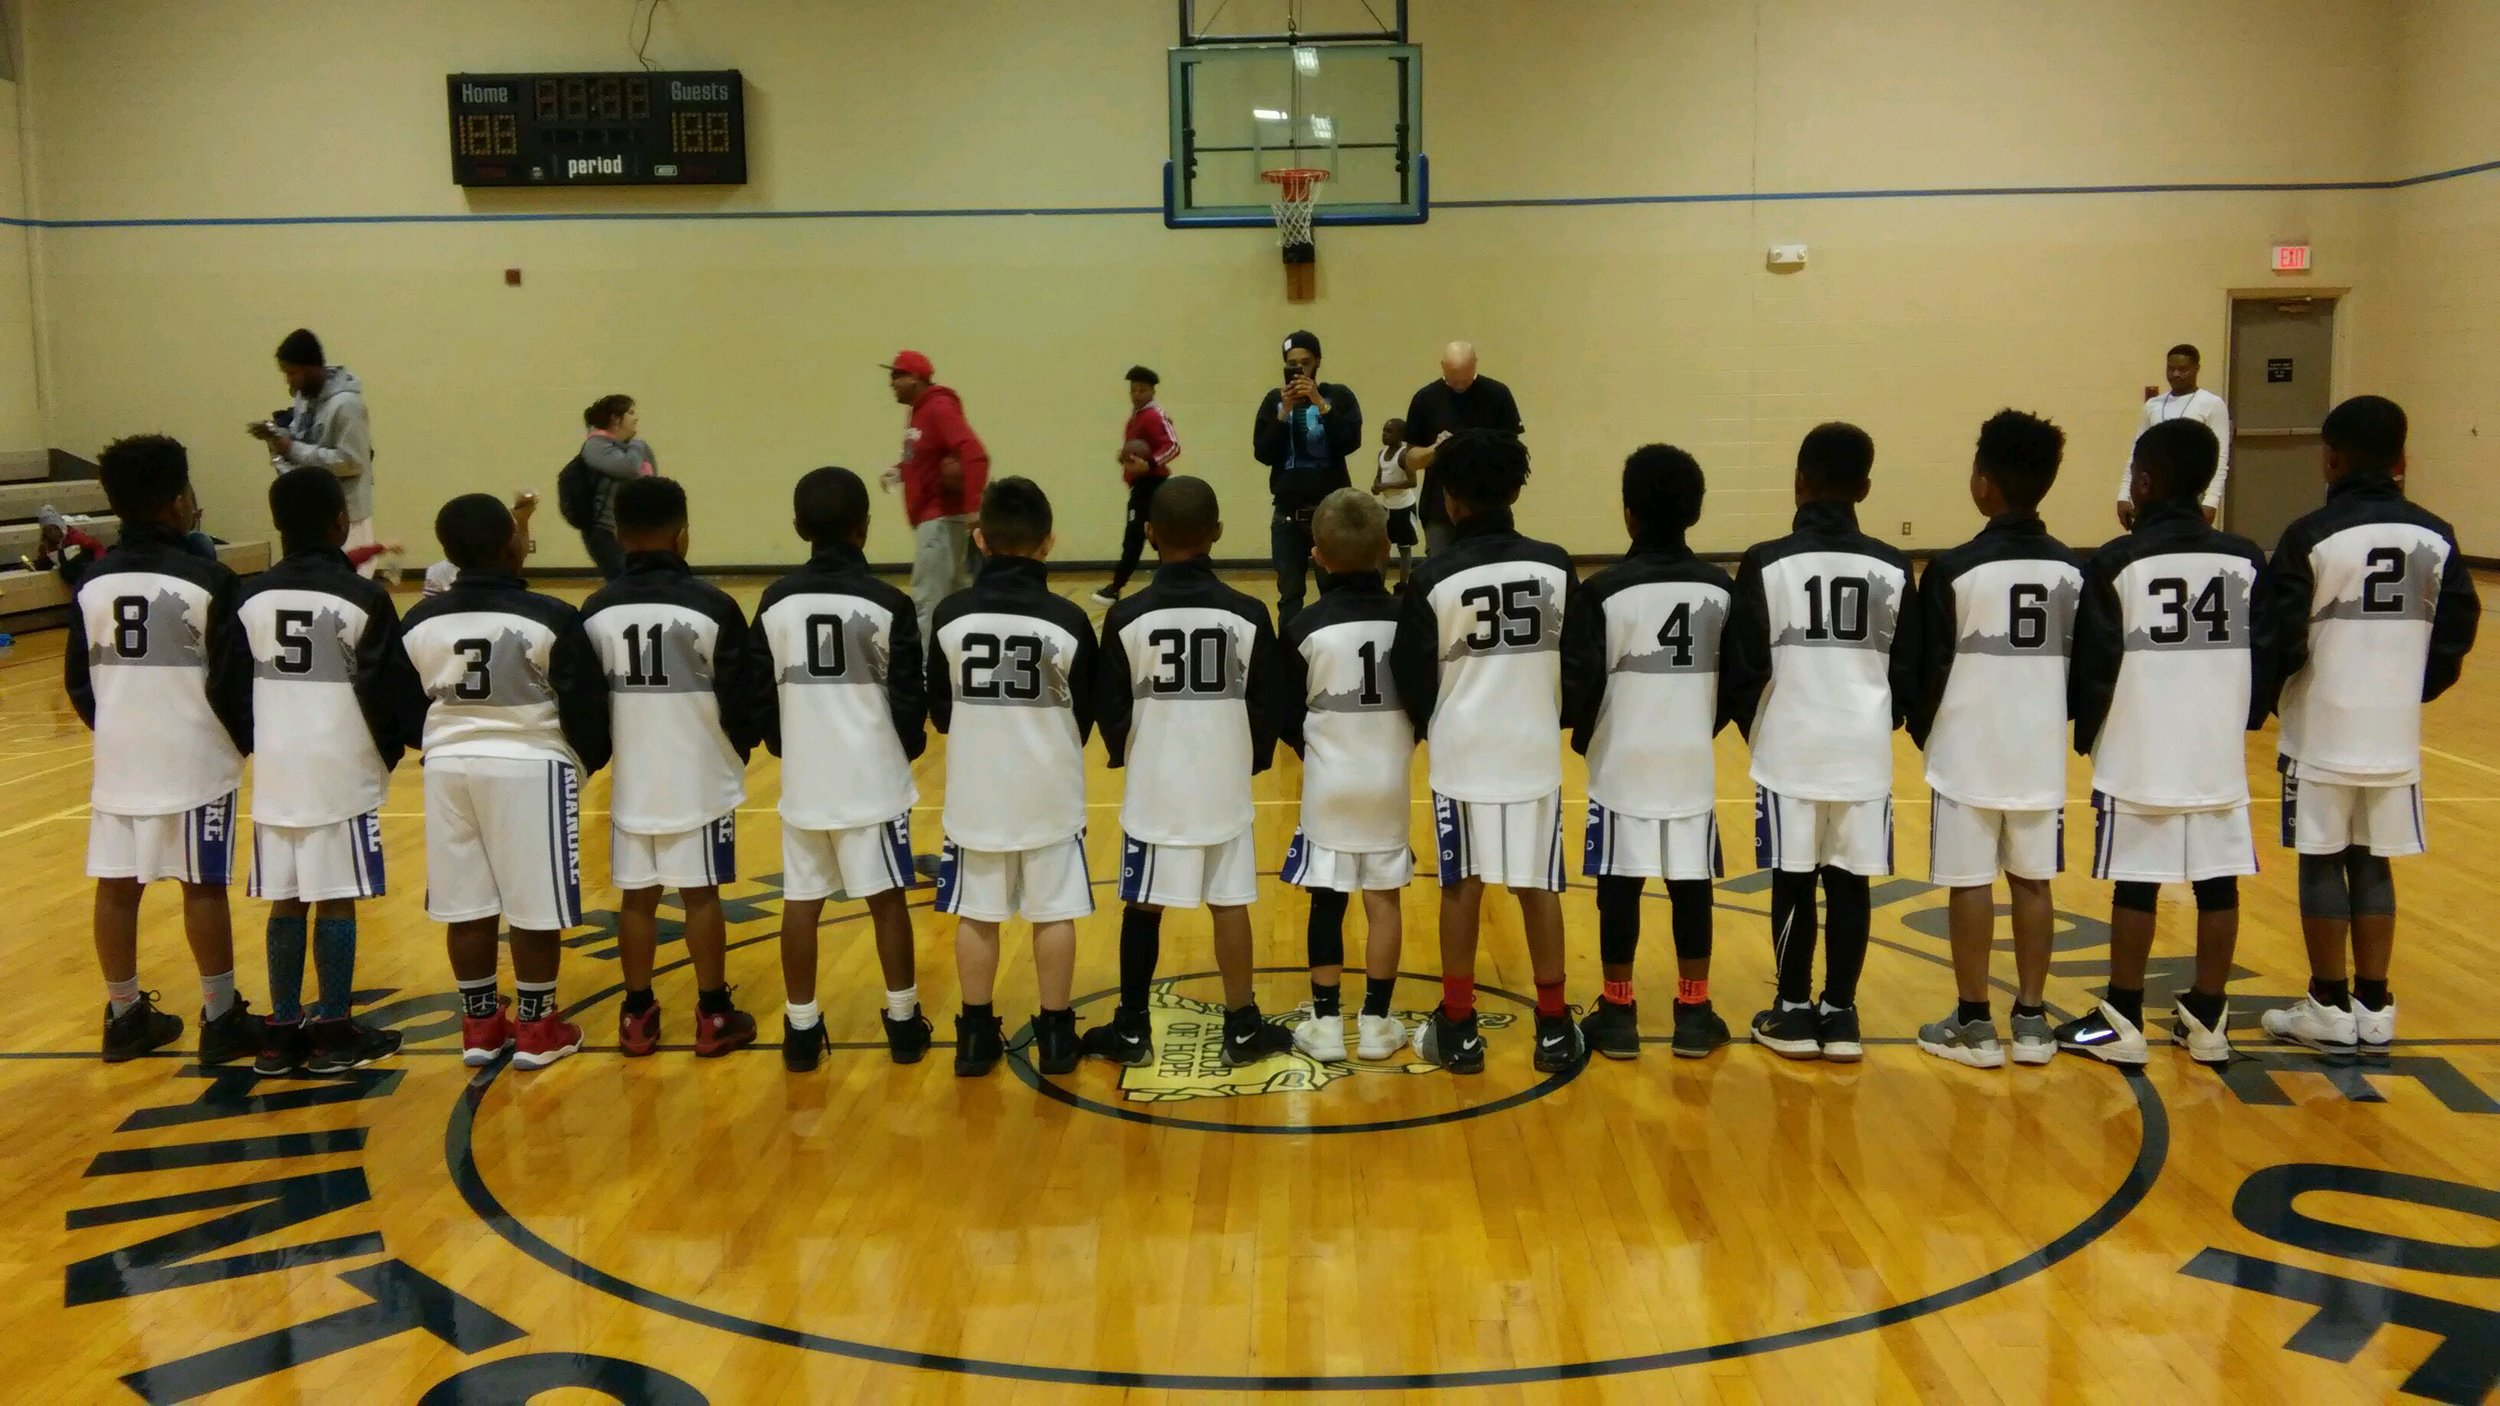 Youth 540 Black White basketball uniforms, jerseys, and shorts